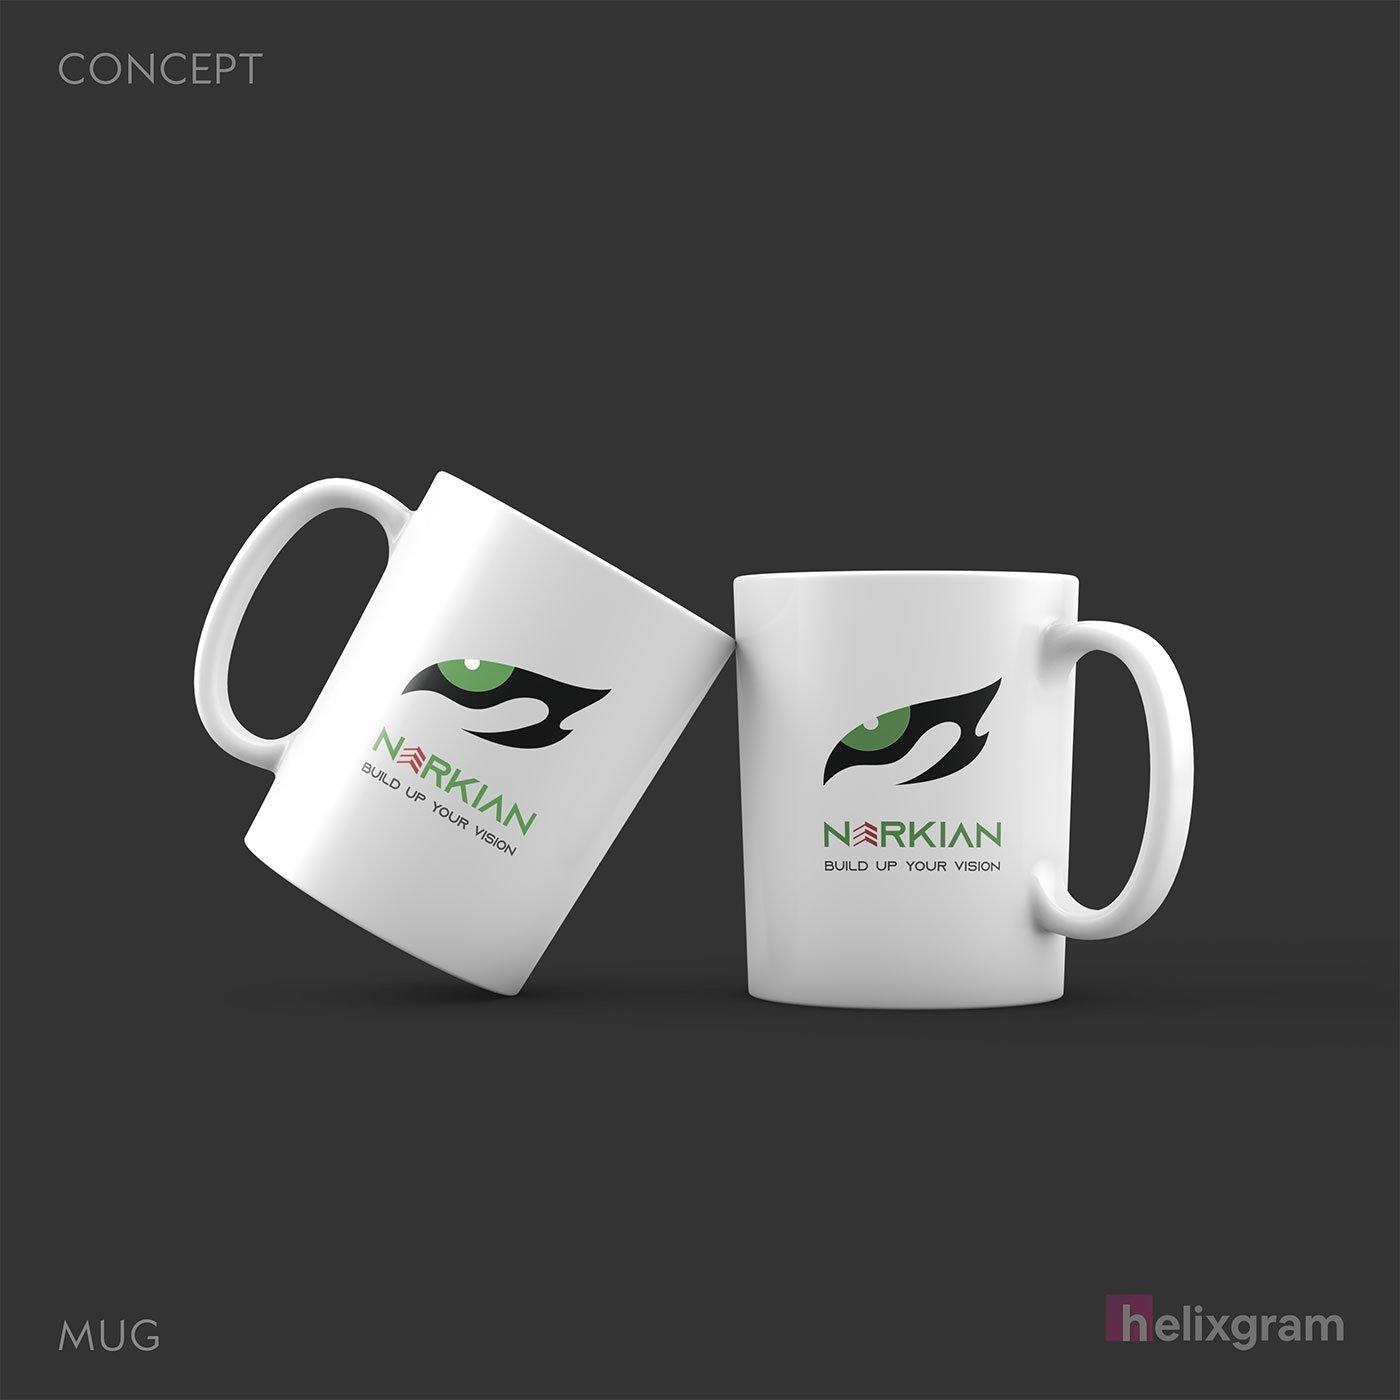 Brand-Identity-Mug-Cup-Narkian-design-visual-identity-design-package-corporate-identity-design-logo-design-flyer-poster-book-cover-design-web-design-digital-advertising-Helixgram